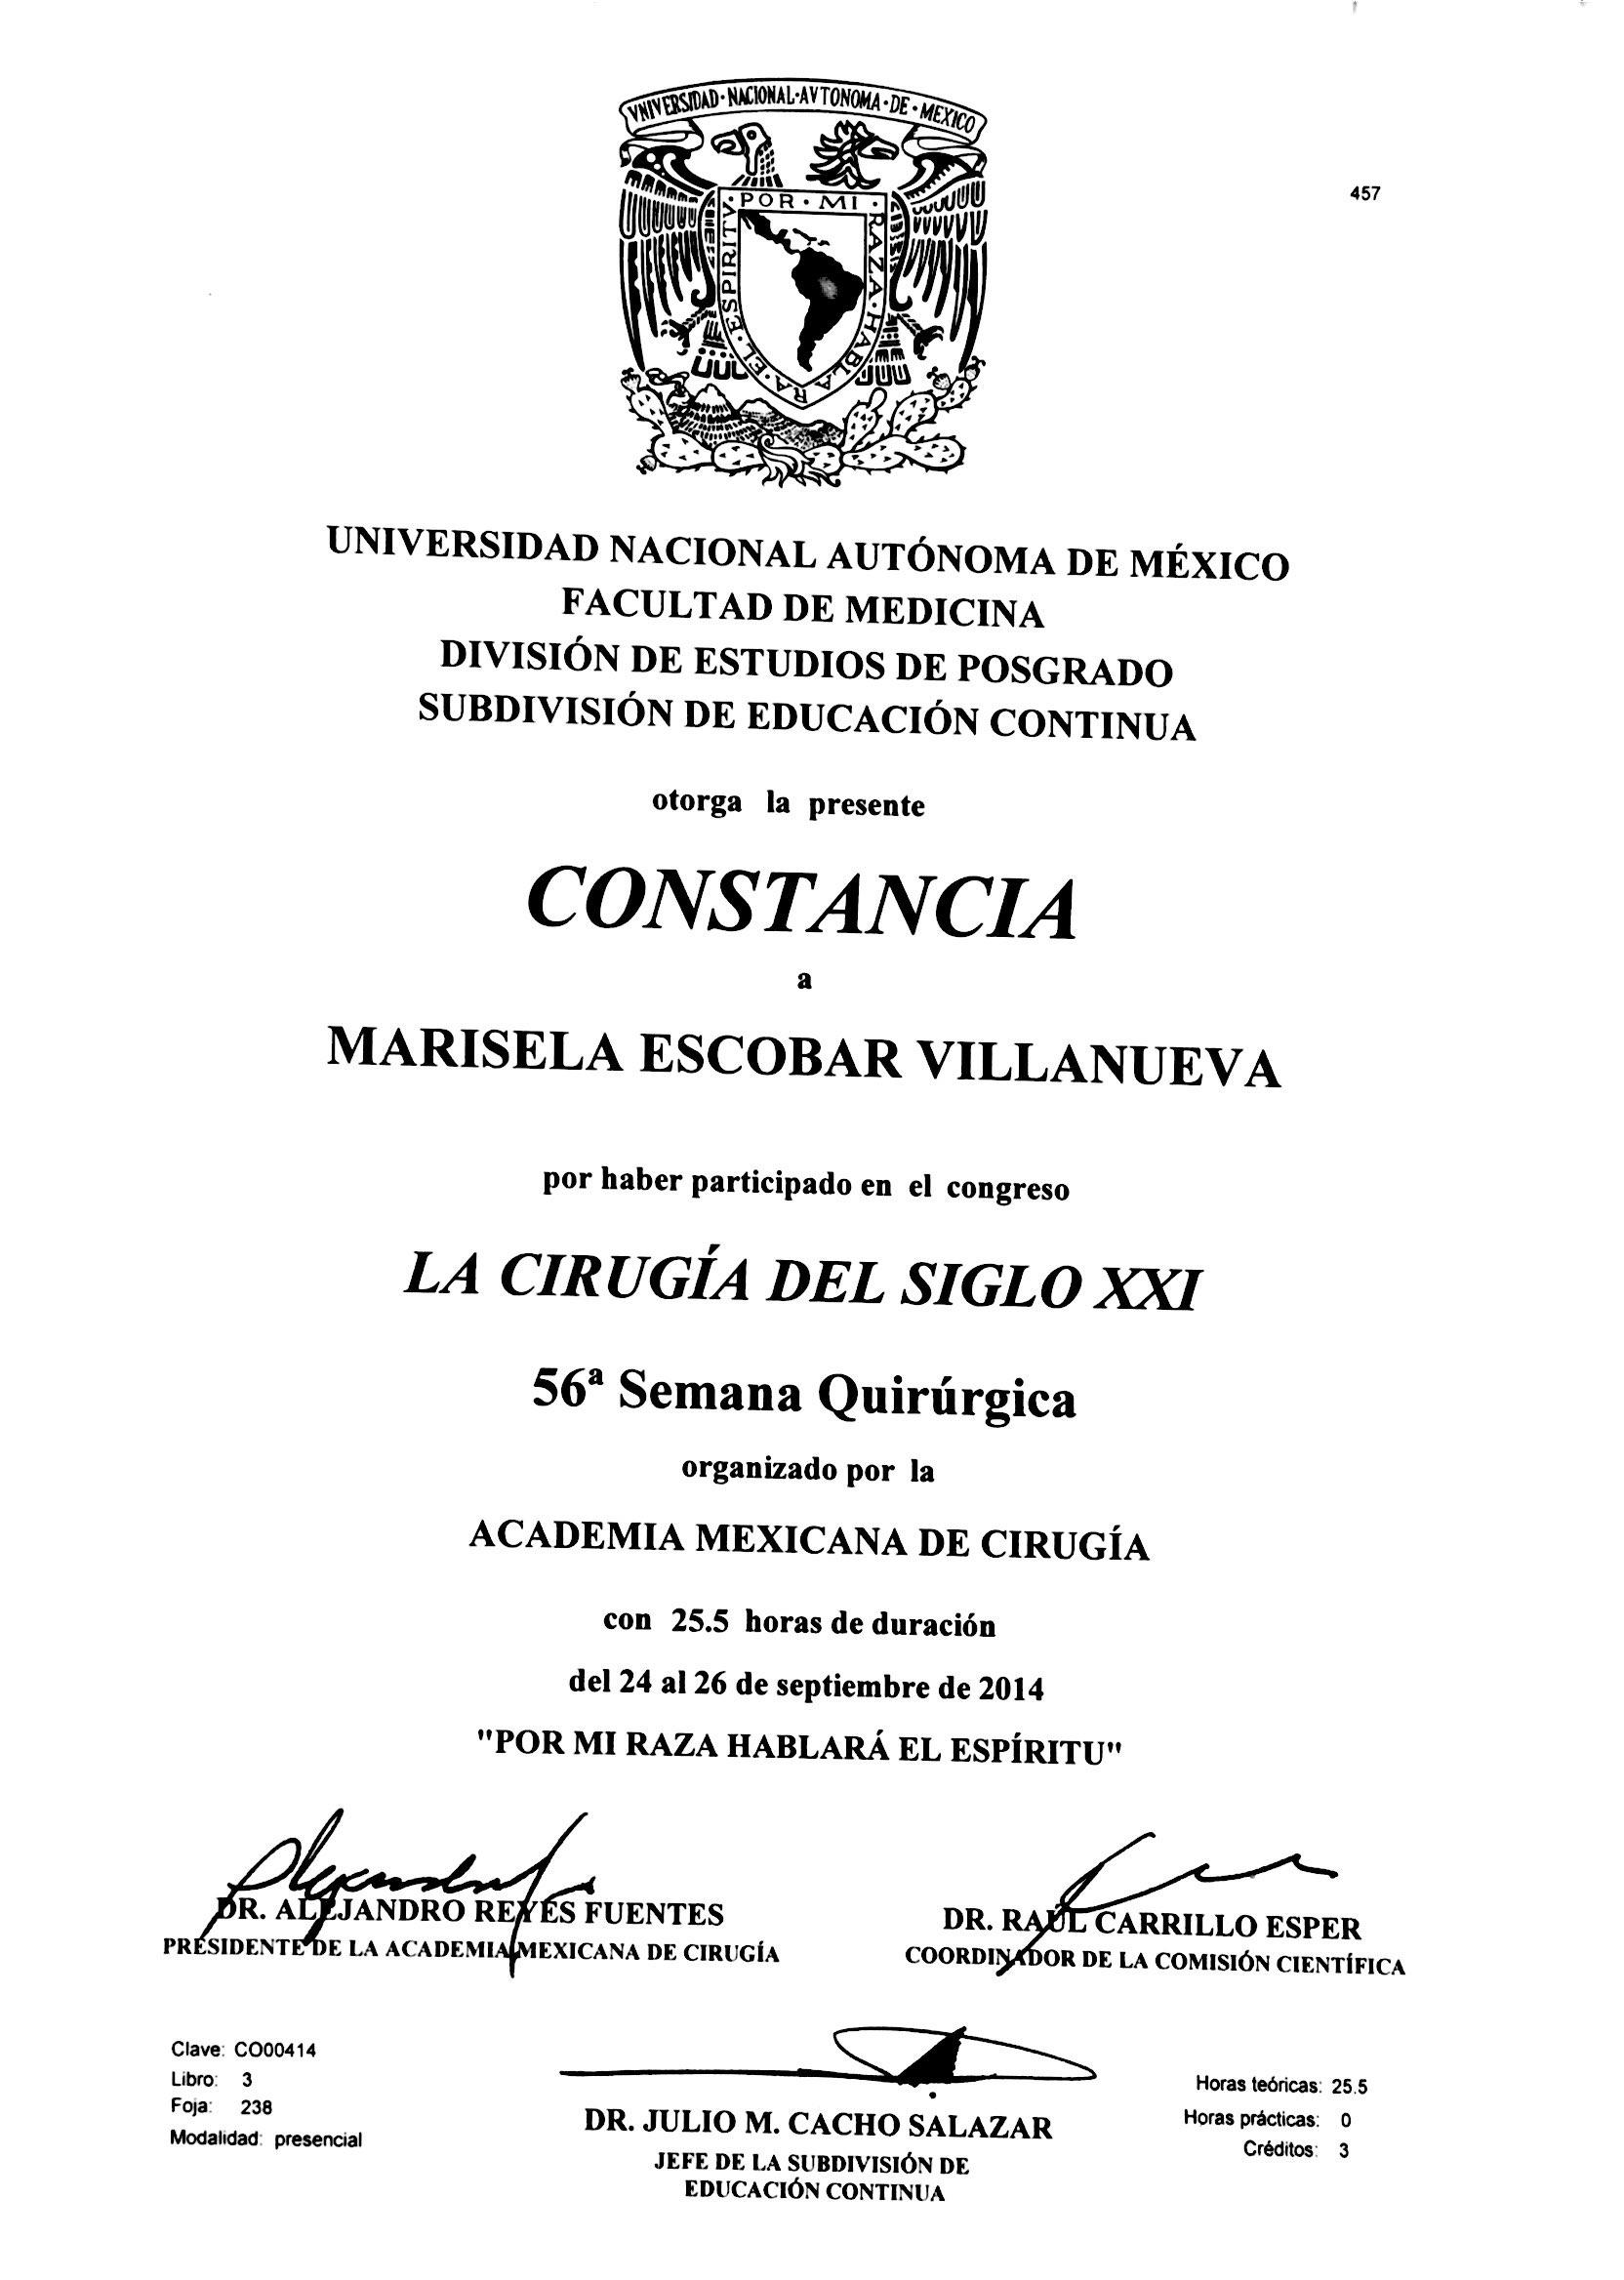 Nuevo doc 2018-02-20 11.21.39_16